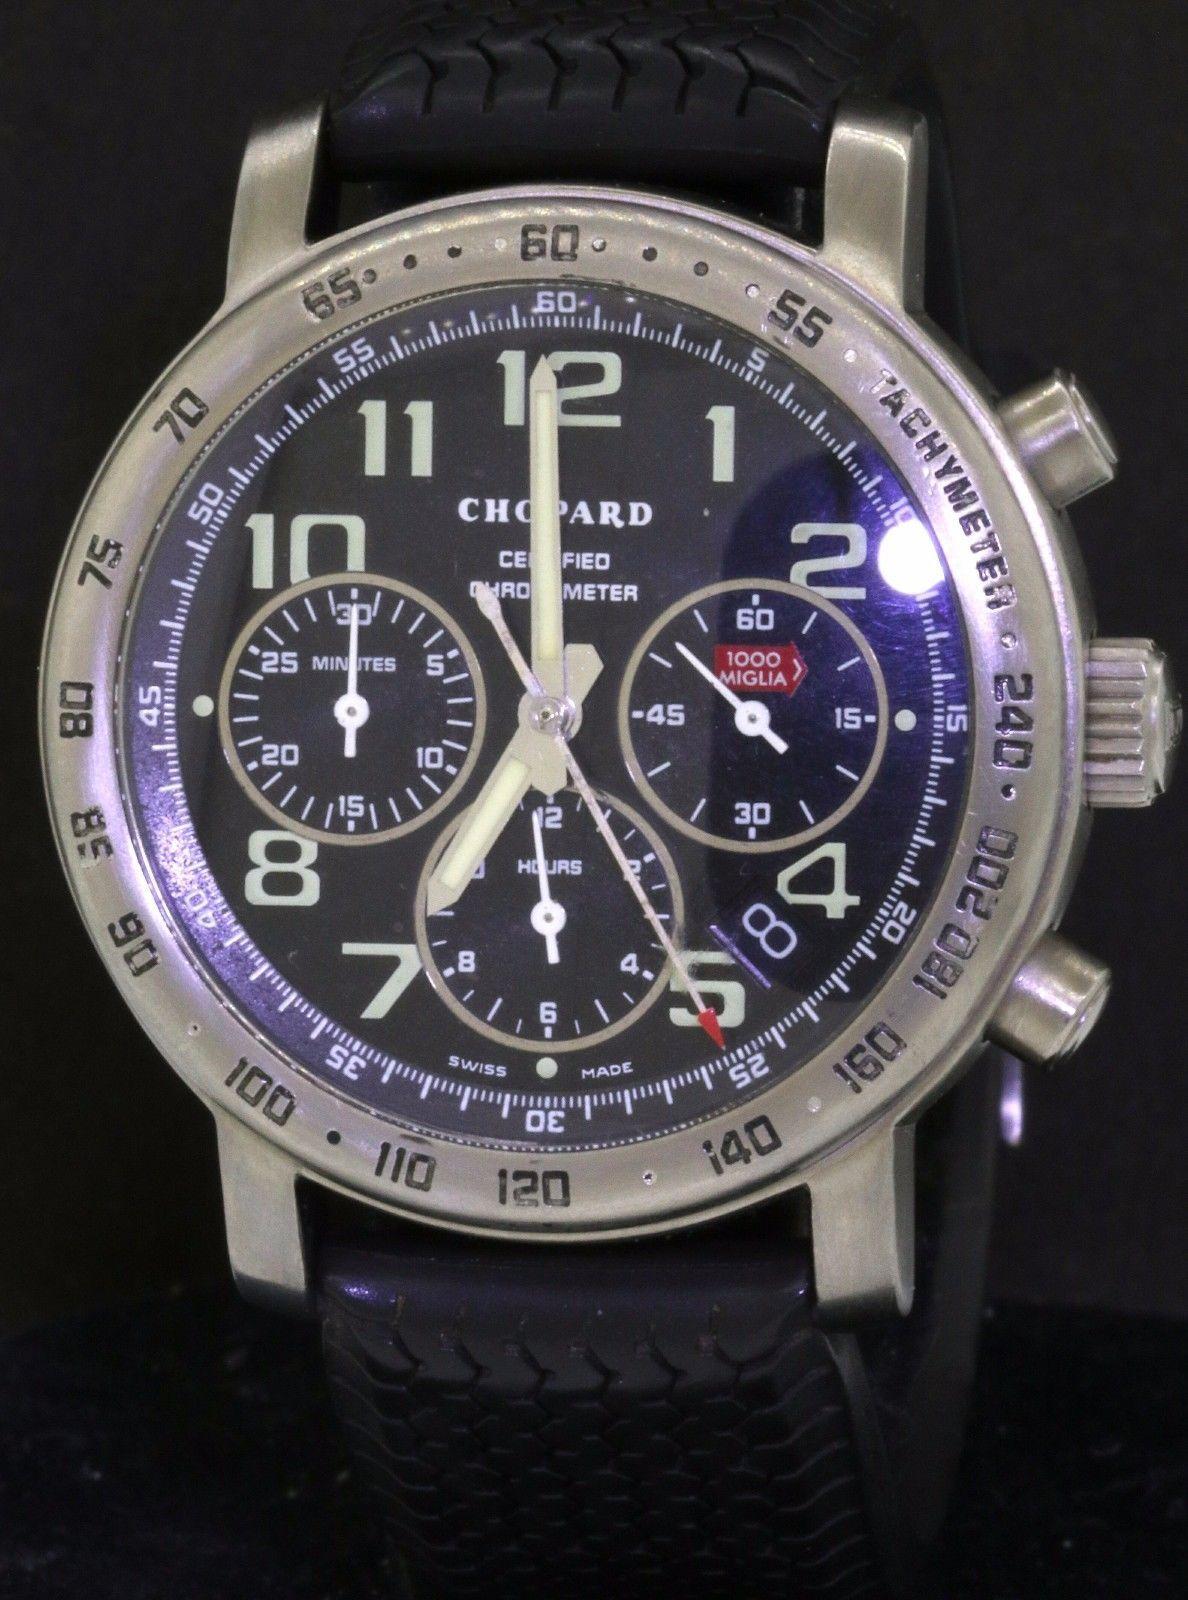 Chopard 1000 Miglia 8915 Titanium automatic chronograph ...